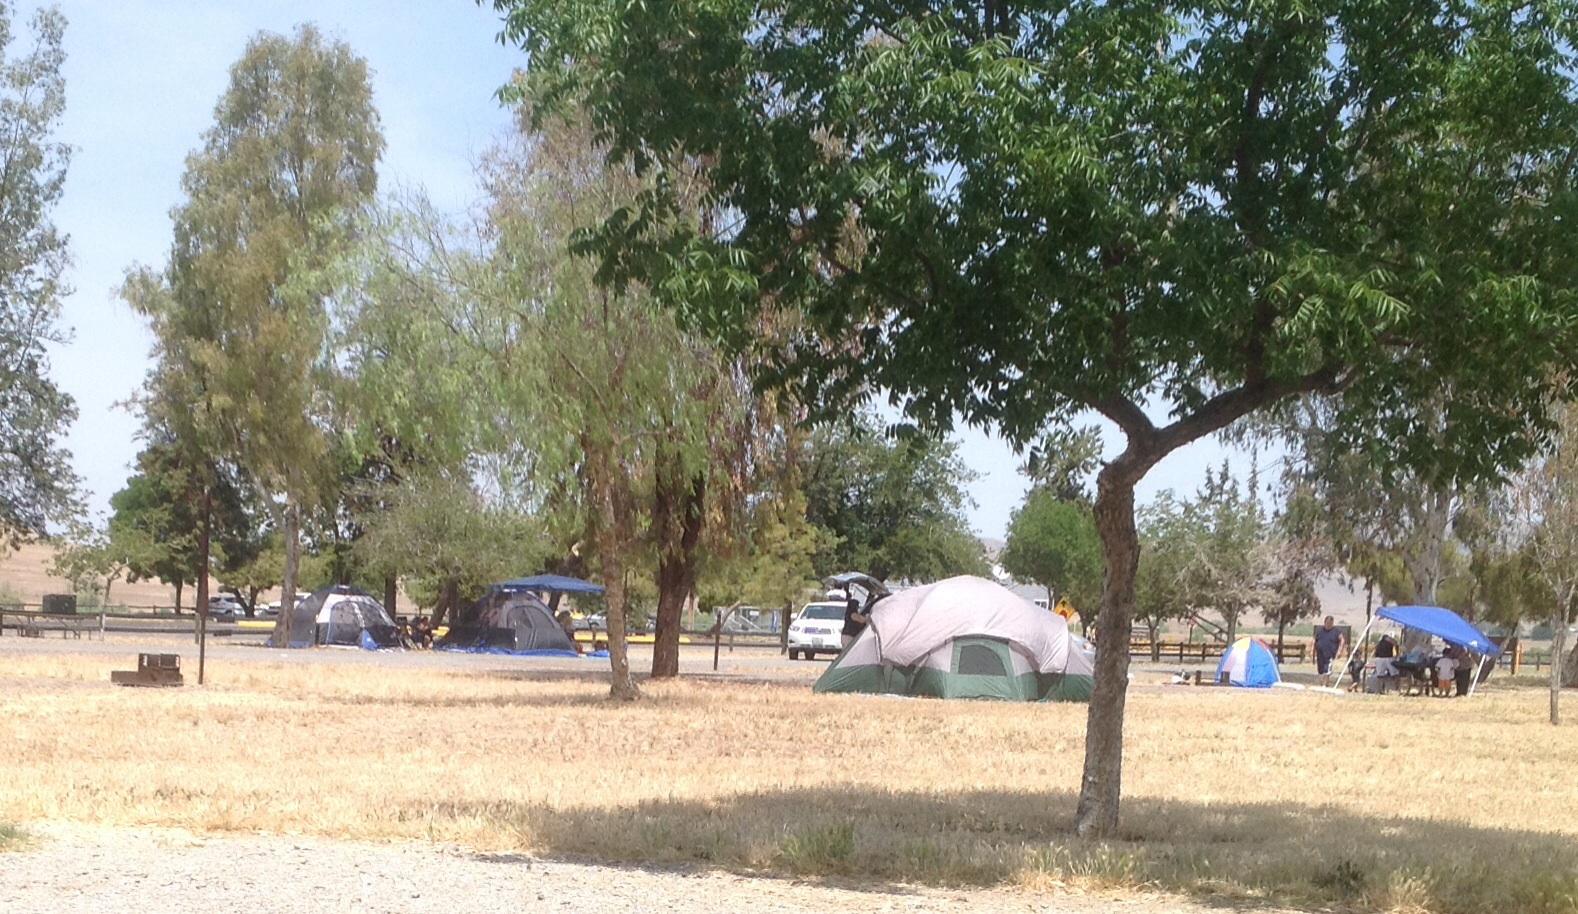 Tule Campground Success Lake COE Porterville CA